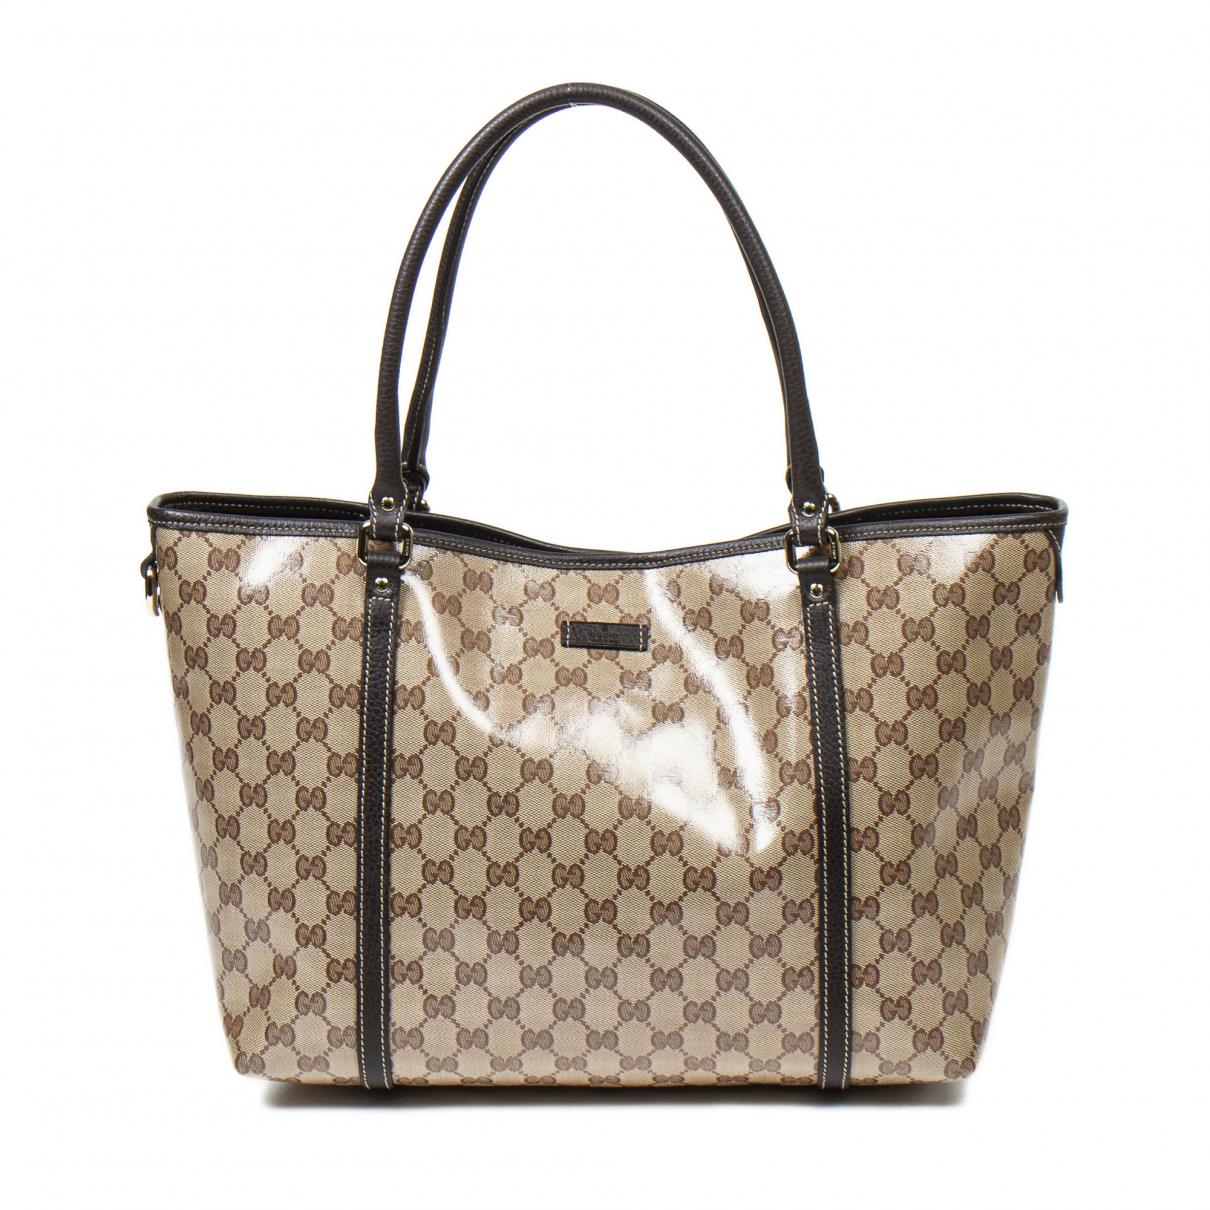 Gucci \N Handtasche in  Beige Synthetik